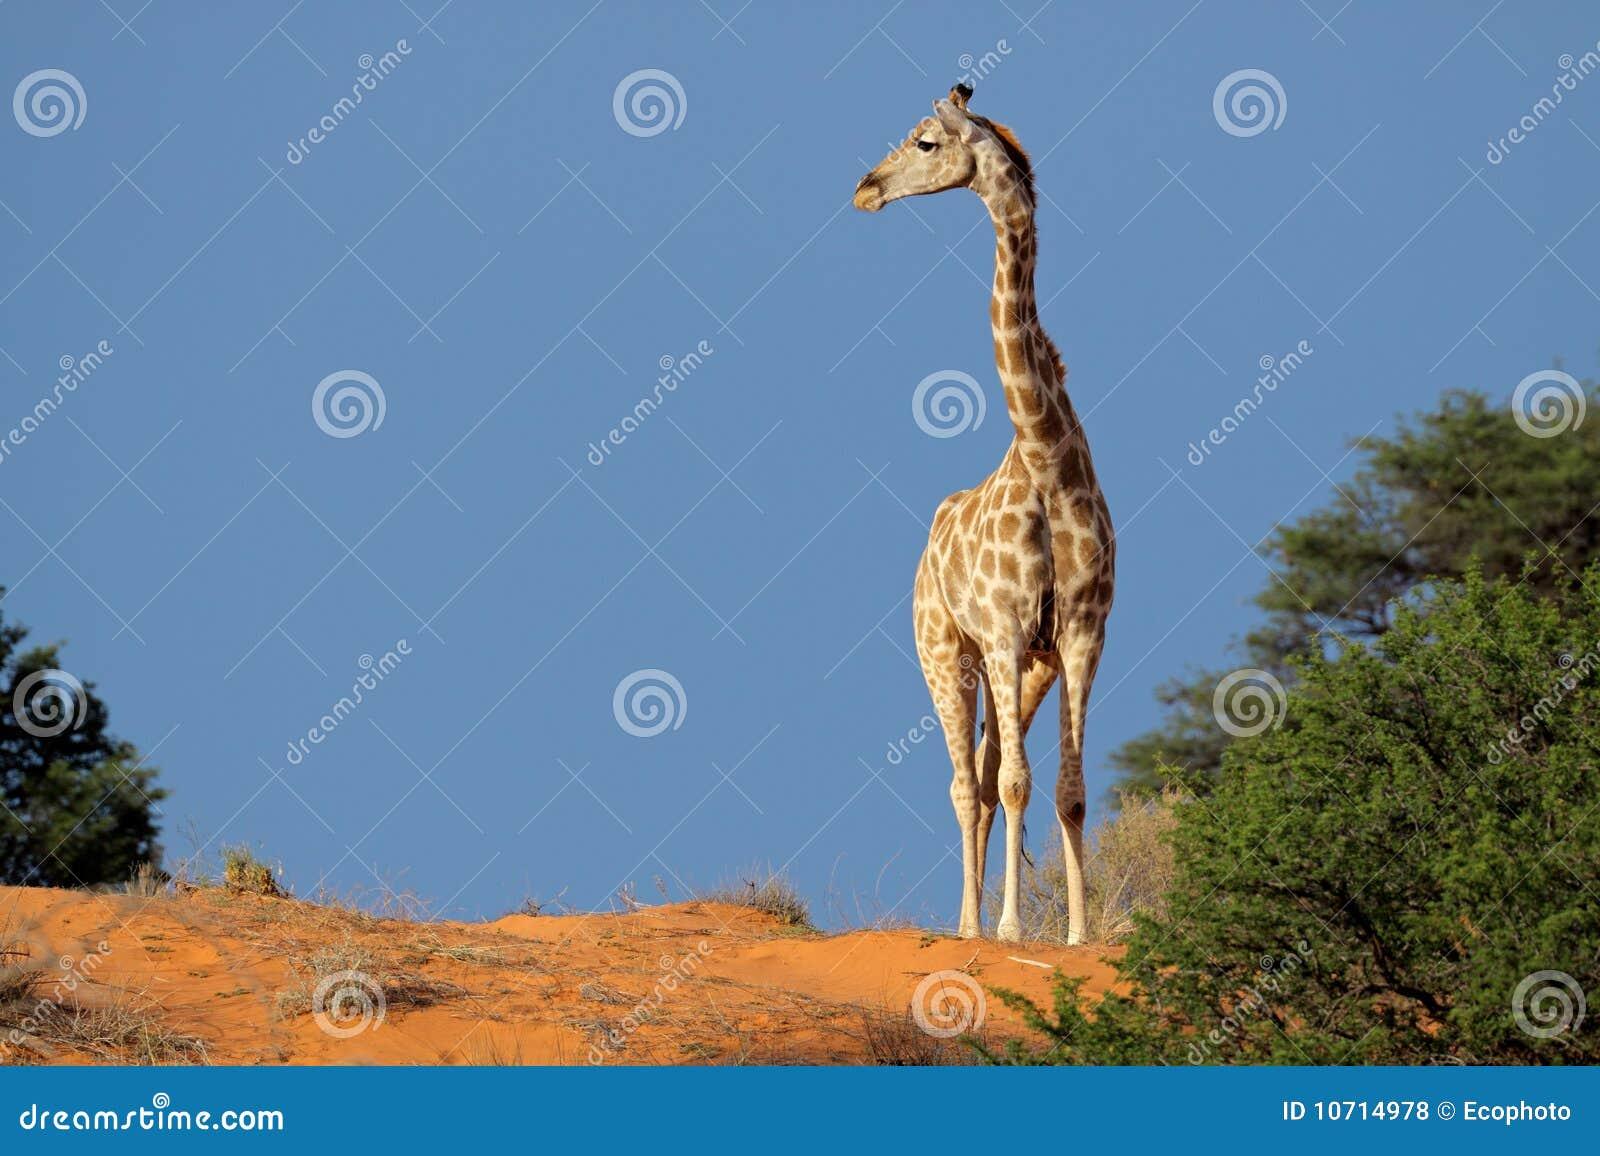 Giraffa, deserto di Kalahari, Sudafrica